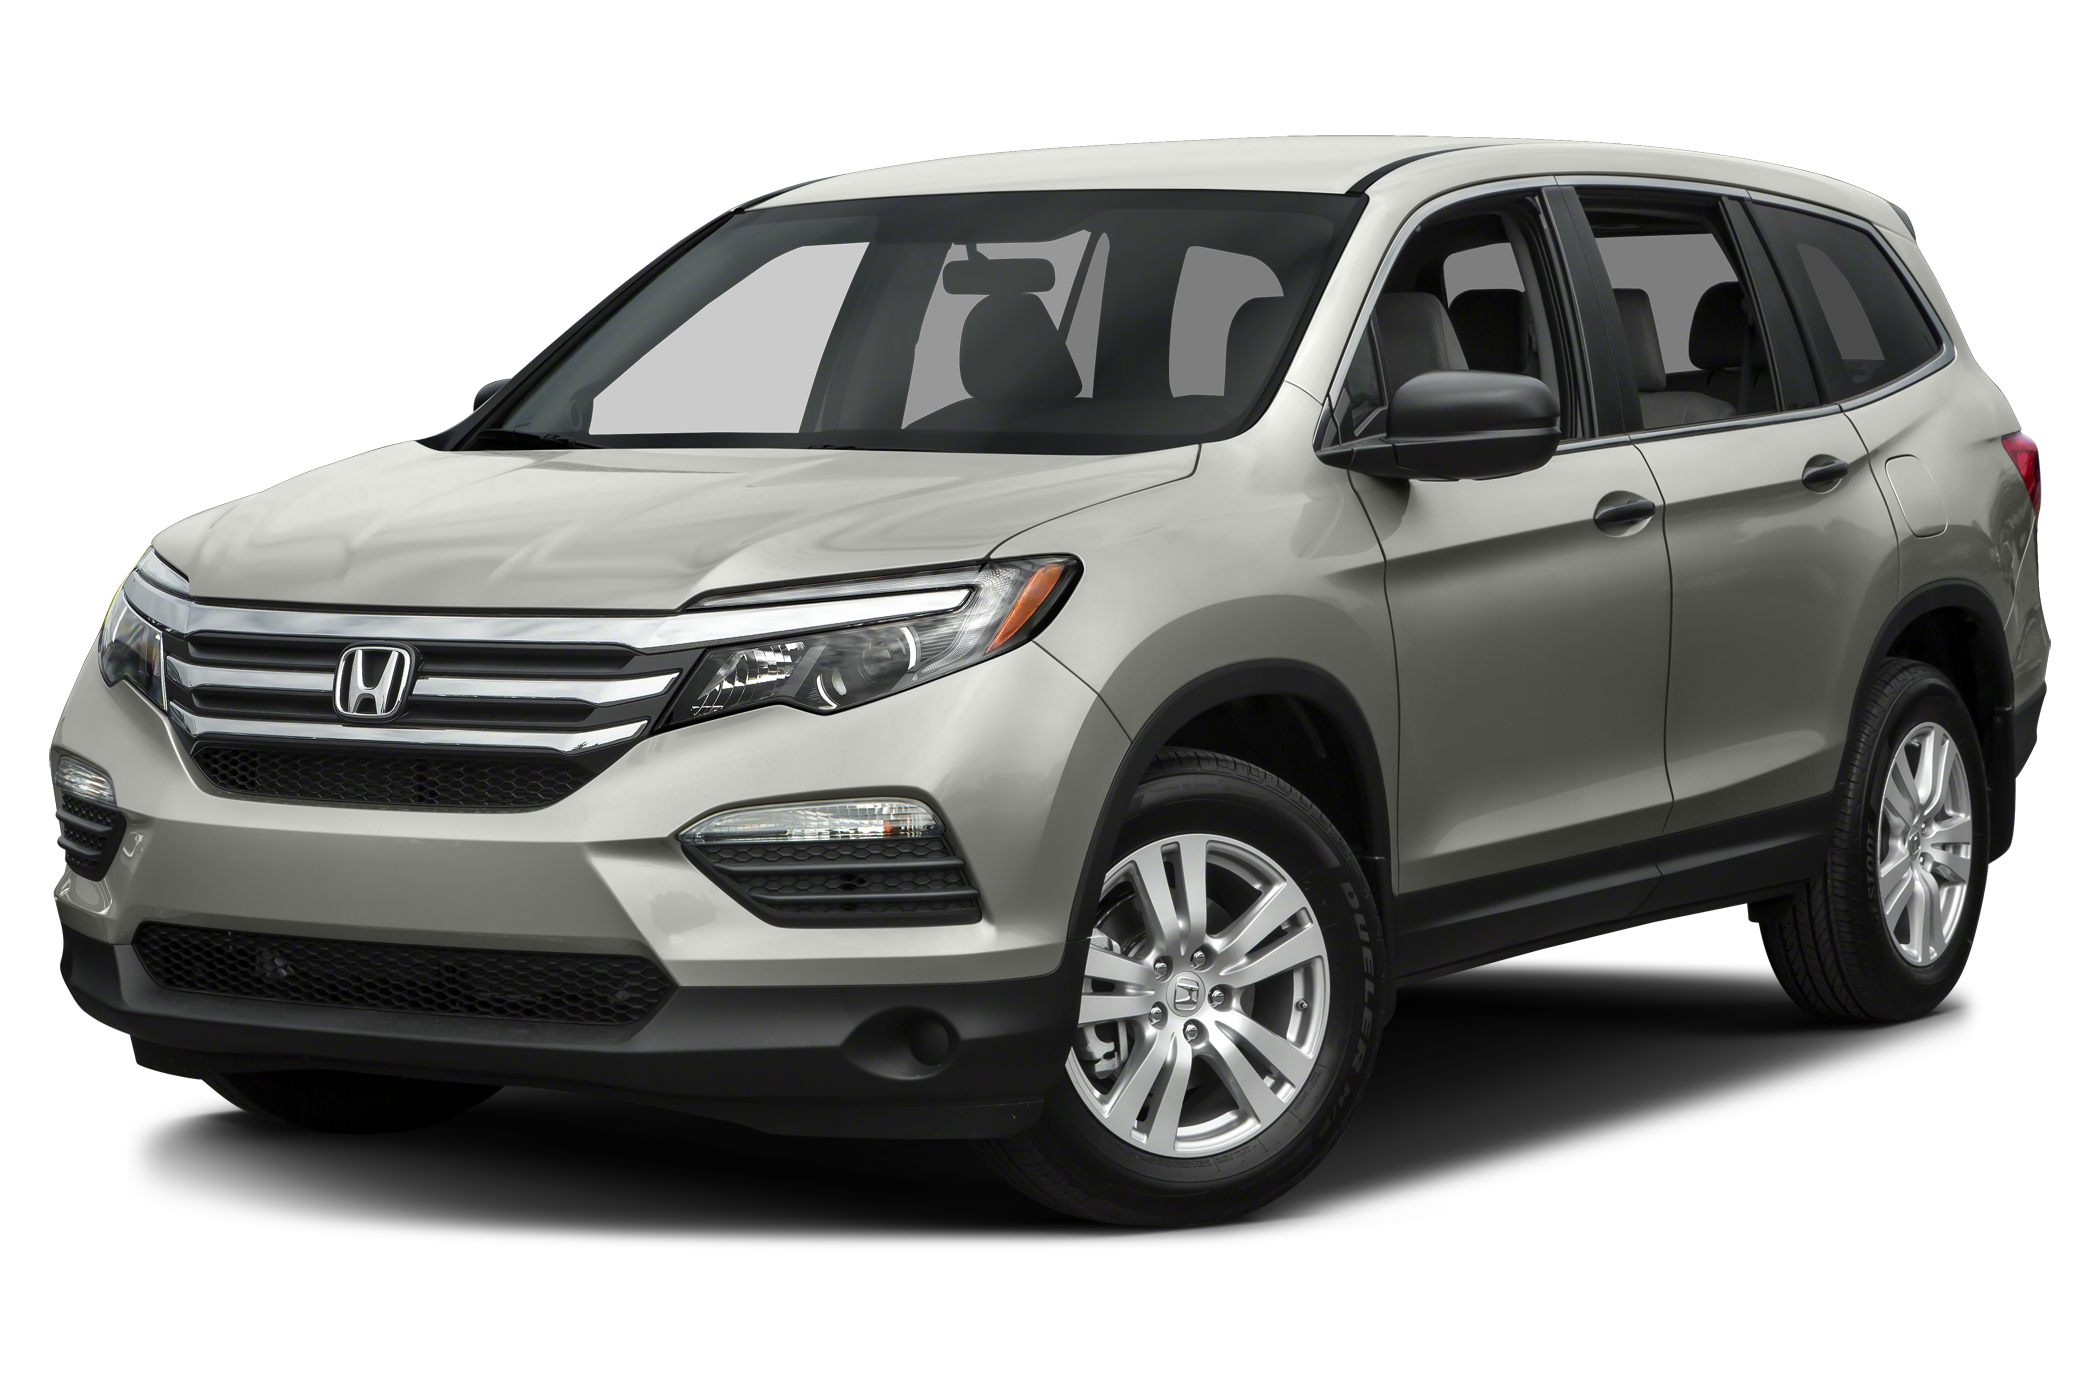 2016 Honda Pilot Pricing And Specs